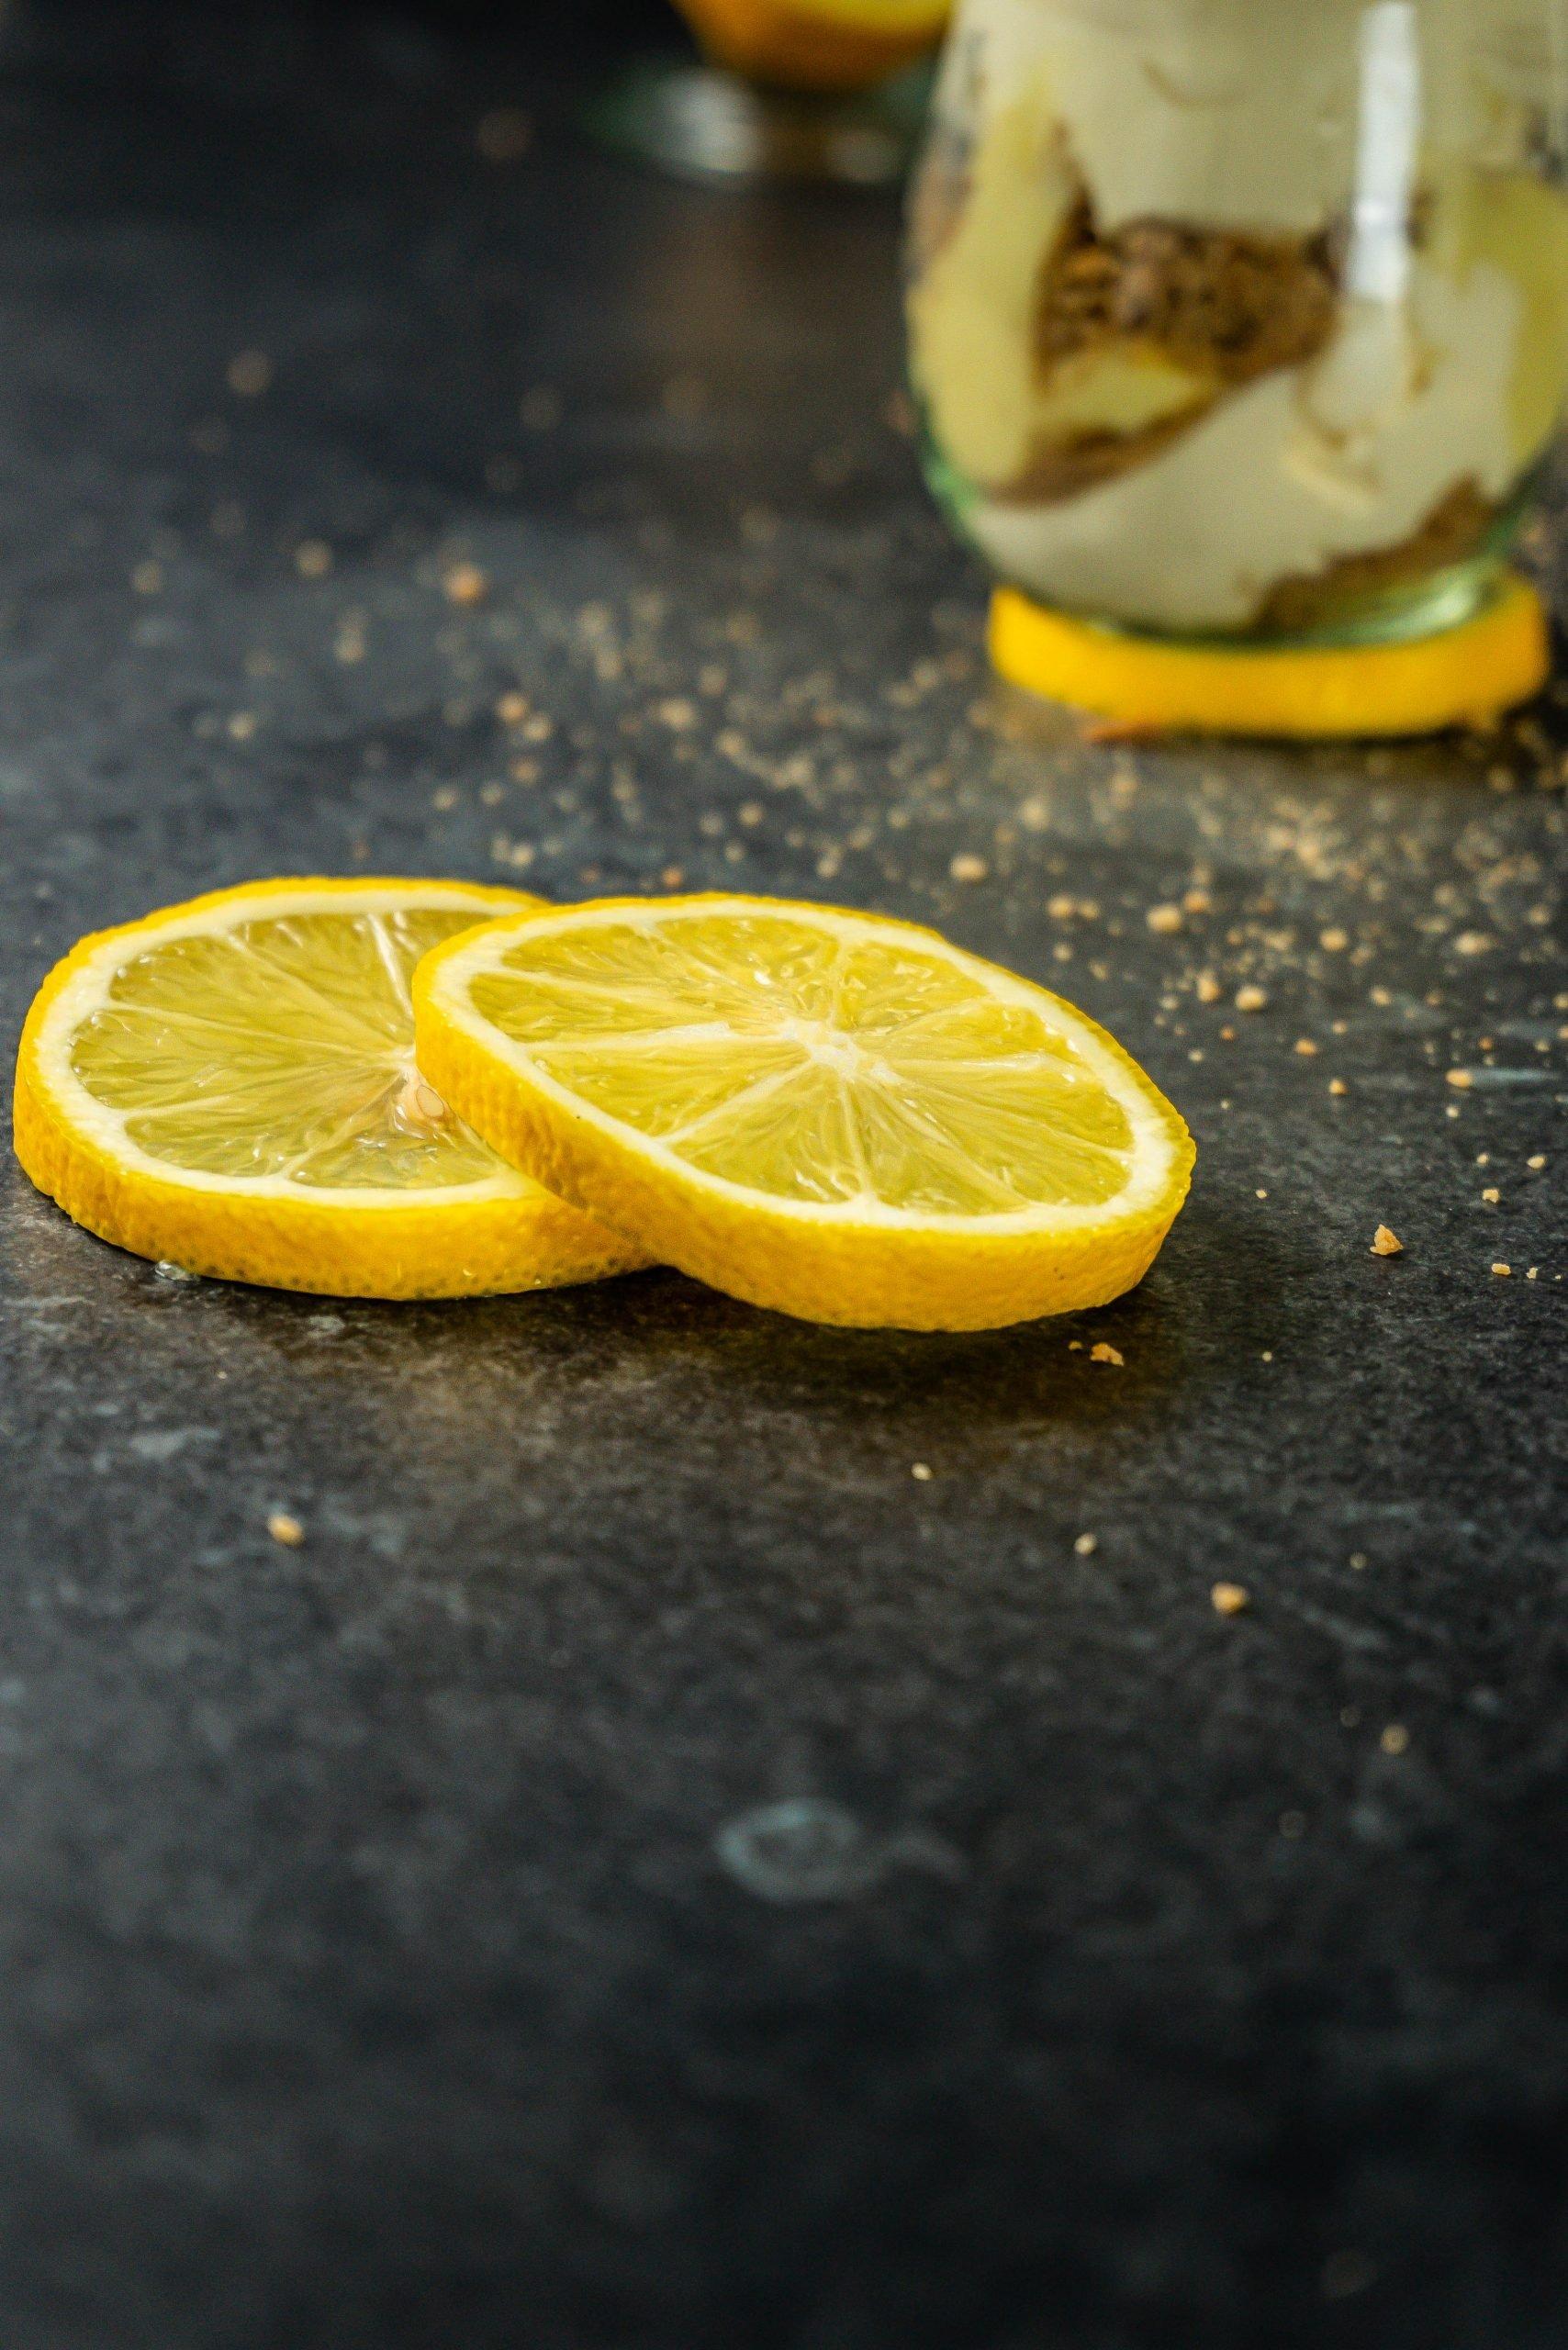 Lemon slices, photographed on a dark background